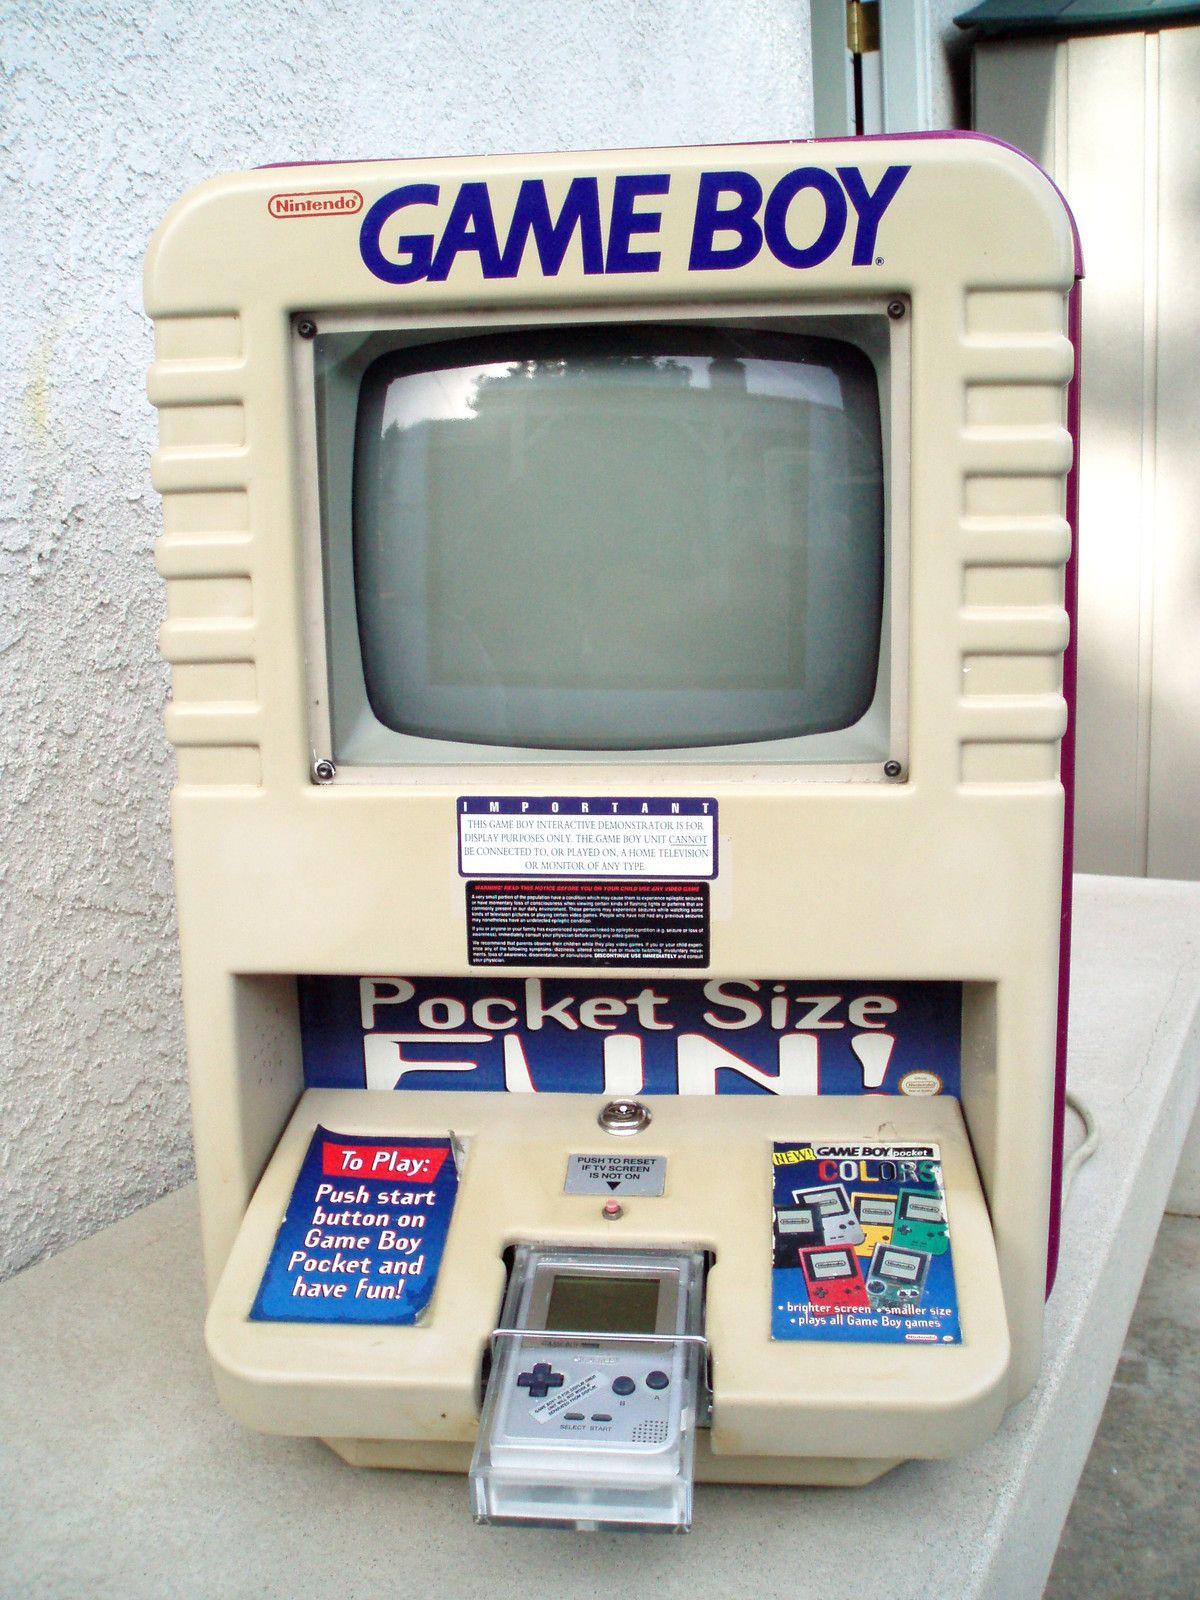 consolas de videojuegos cali